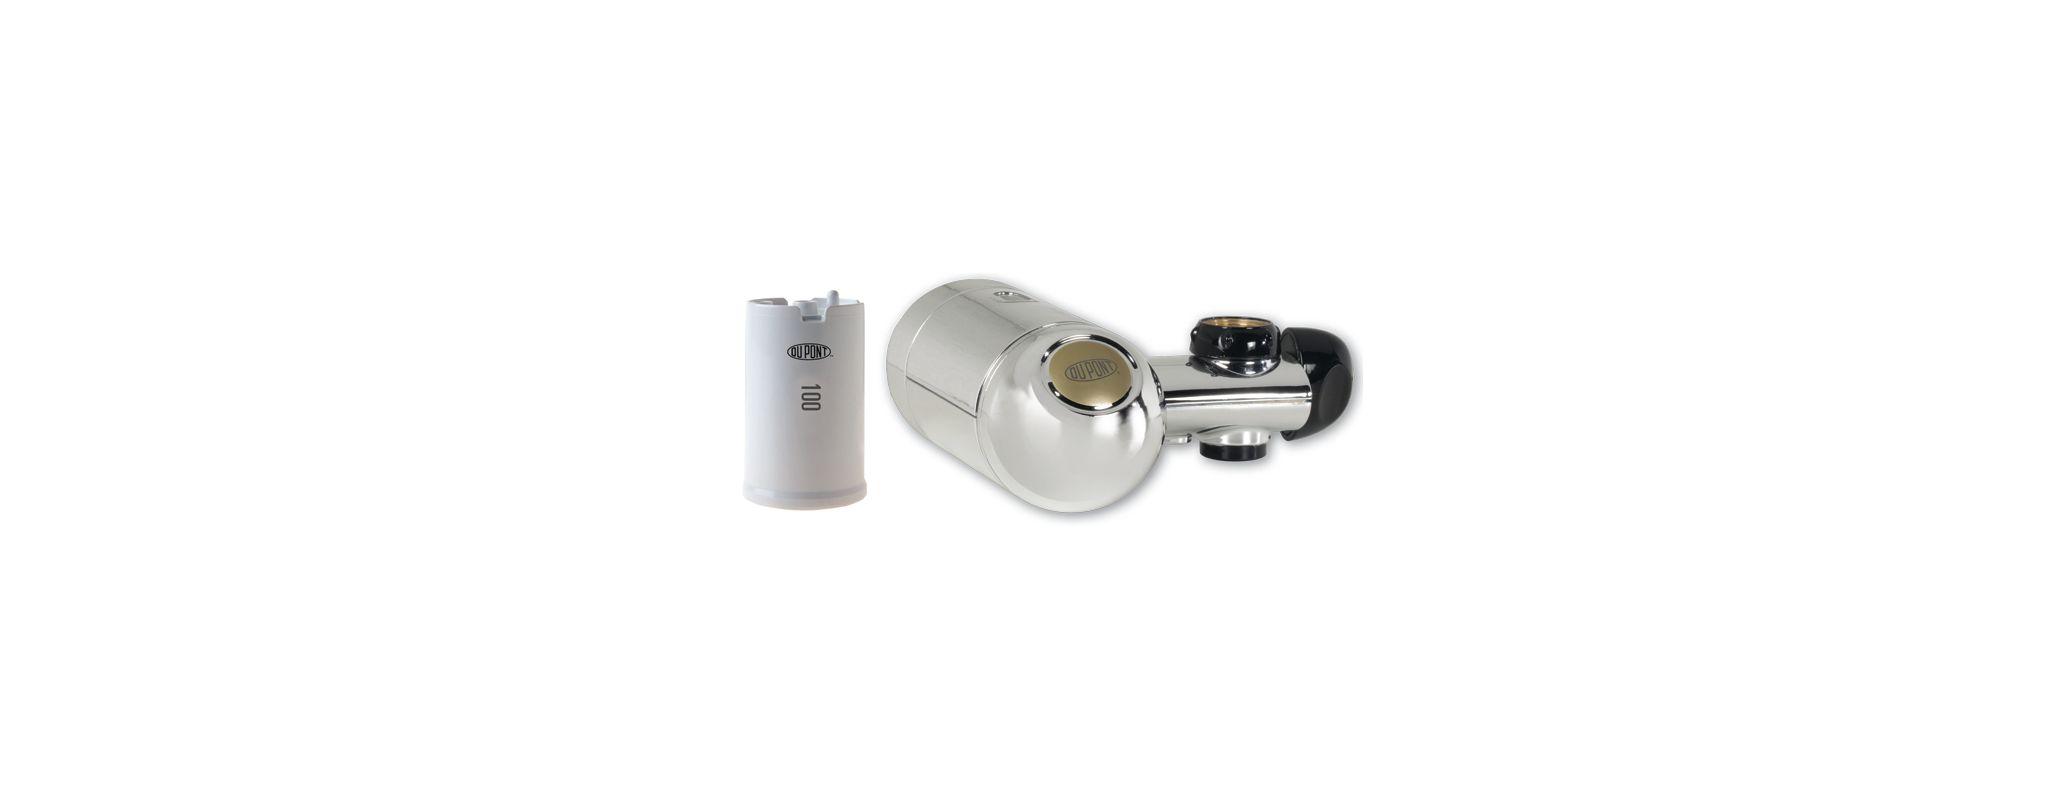 UPC 186366000820 - DuPont WFFM300XCH N/A Faucet Mount Filter ...